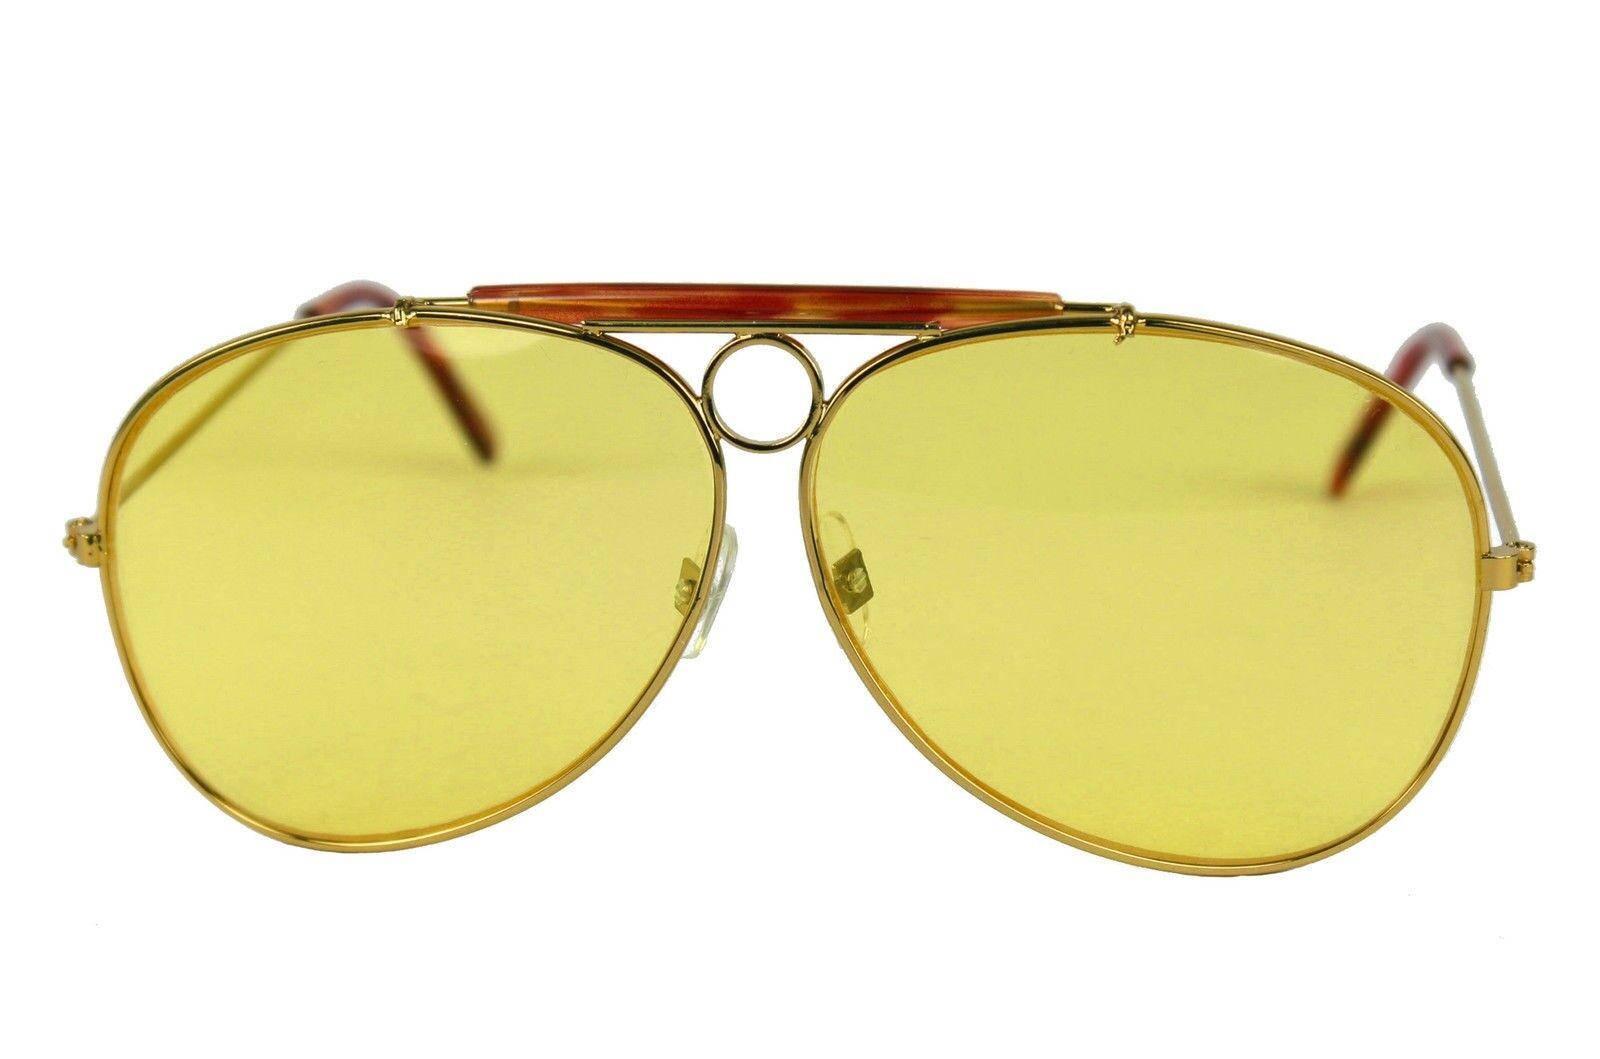 eecd1b10b5be elope Yellow Aviator Sunglasses for sale online